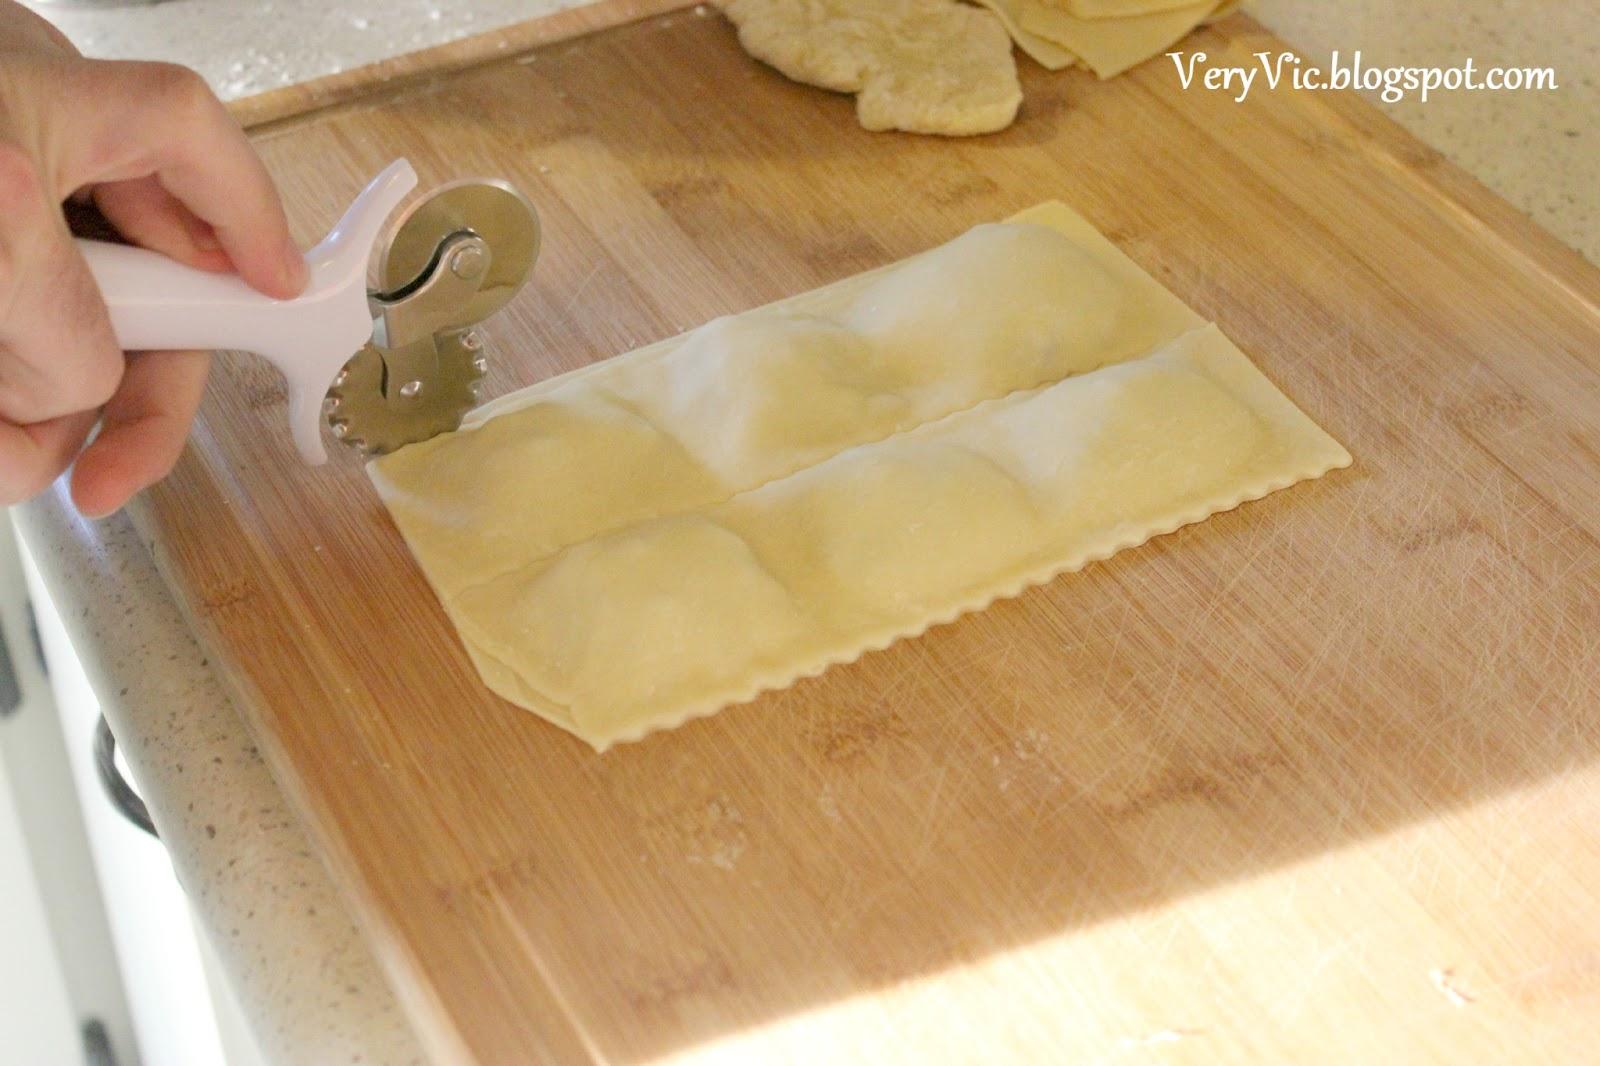 how to cook ravioli on stove